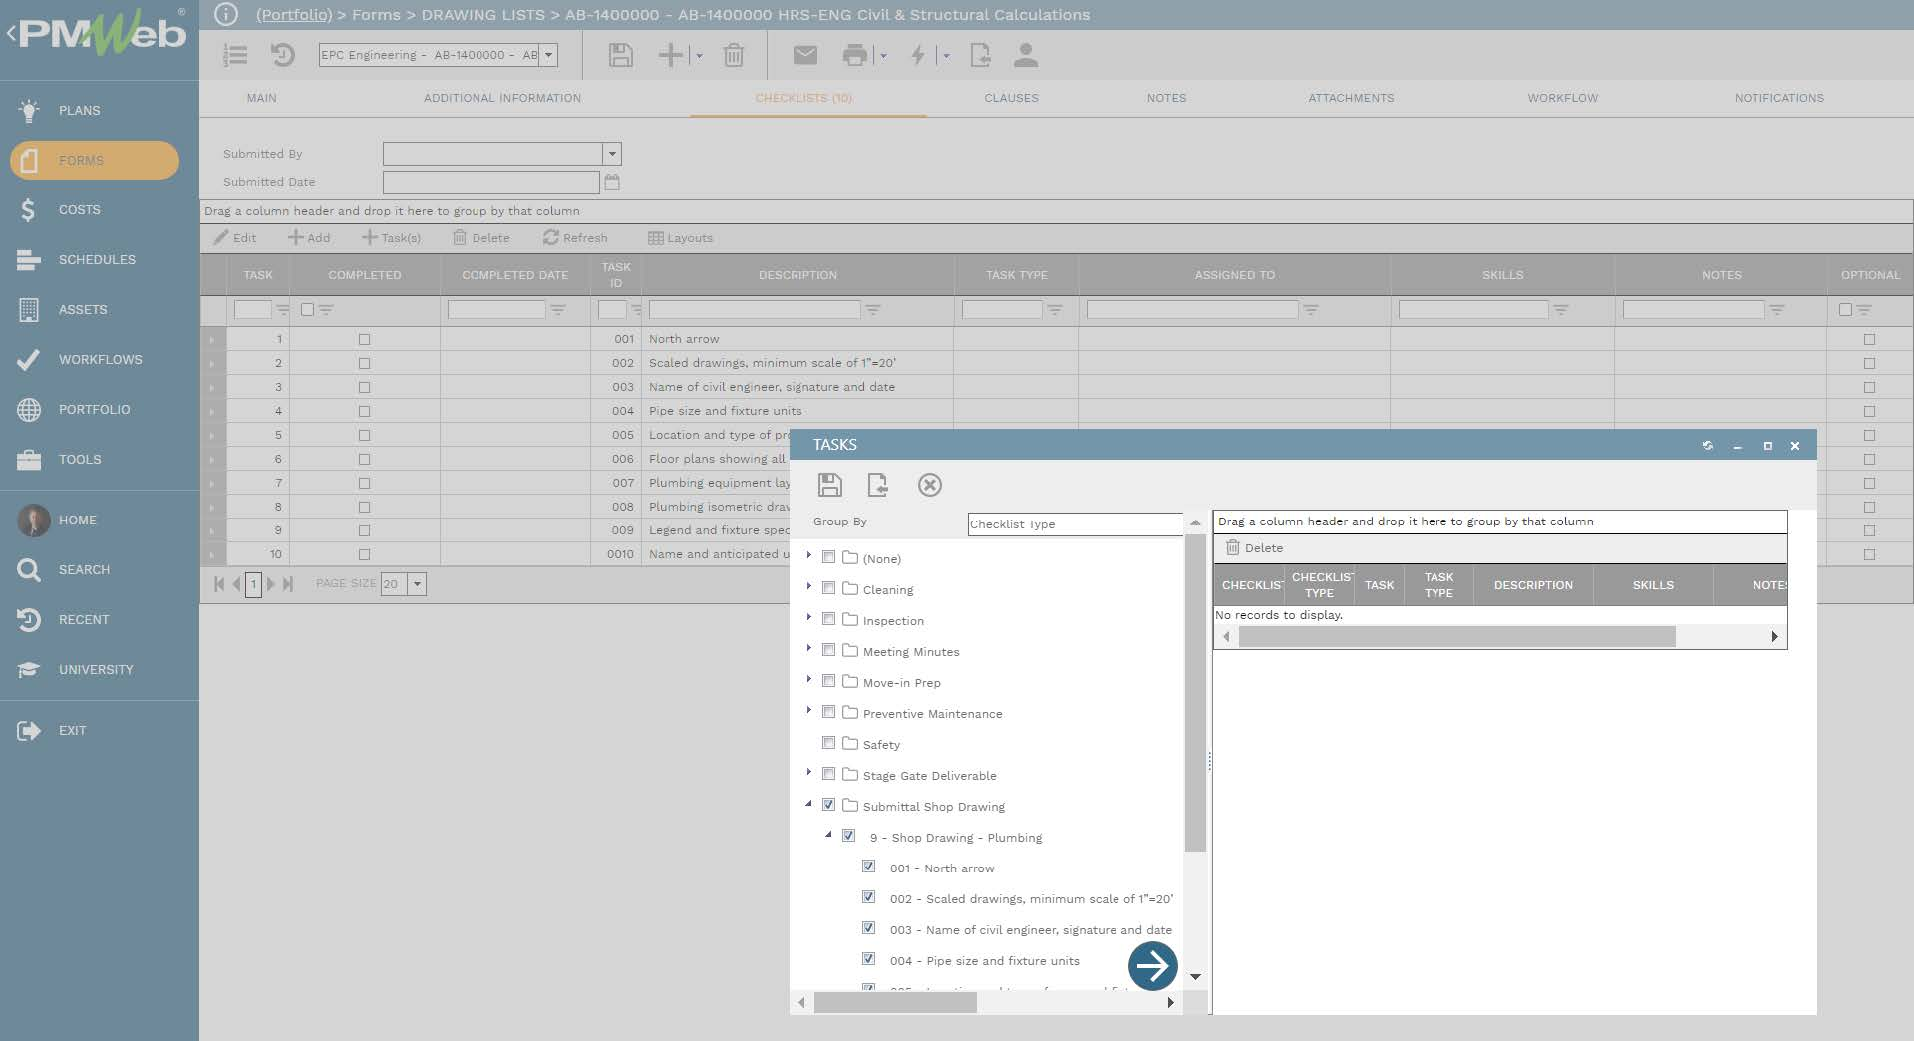 PMWeb 7 Forms Drawing Lists Checklist Tasks